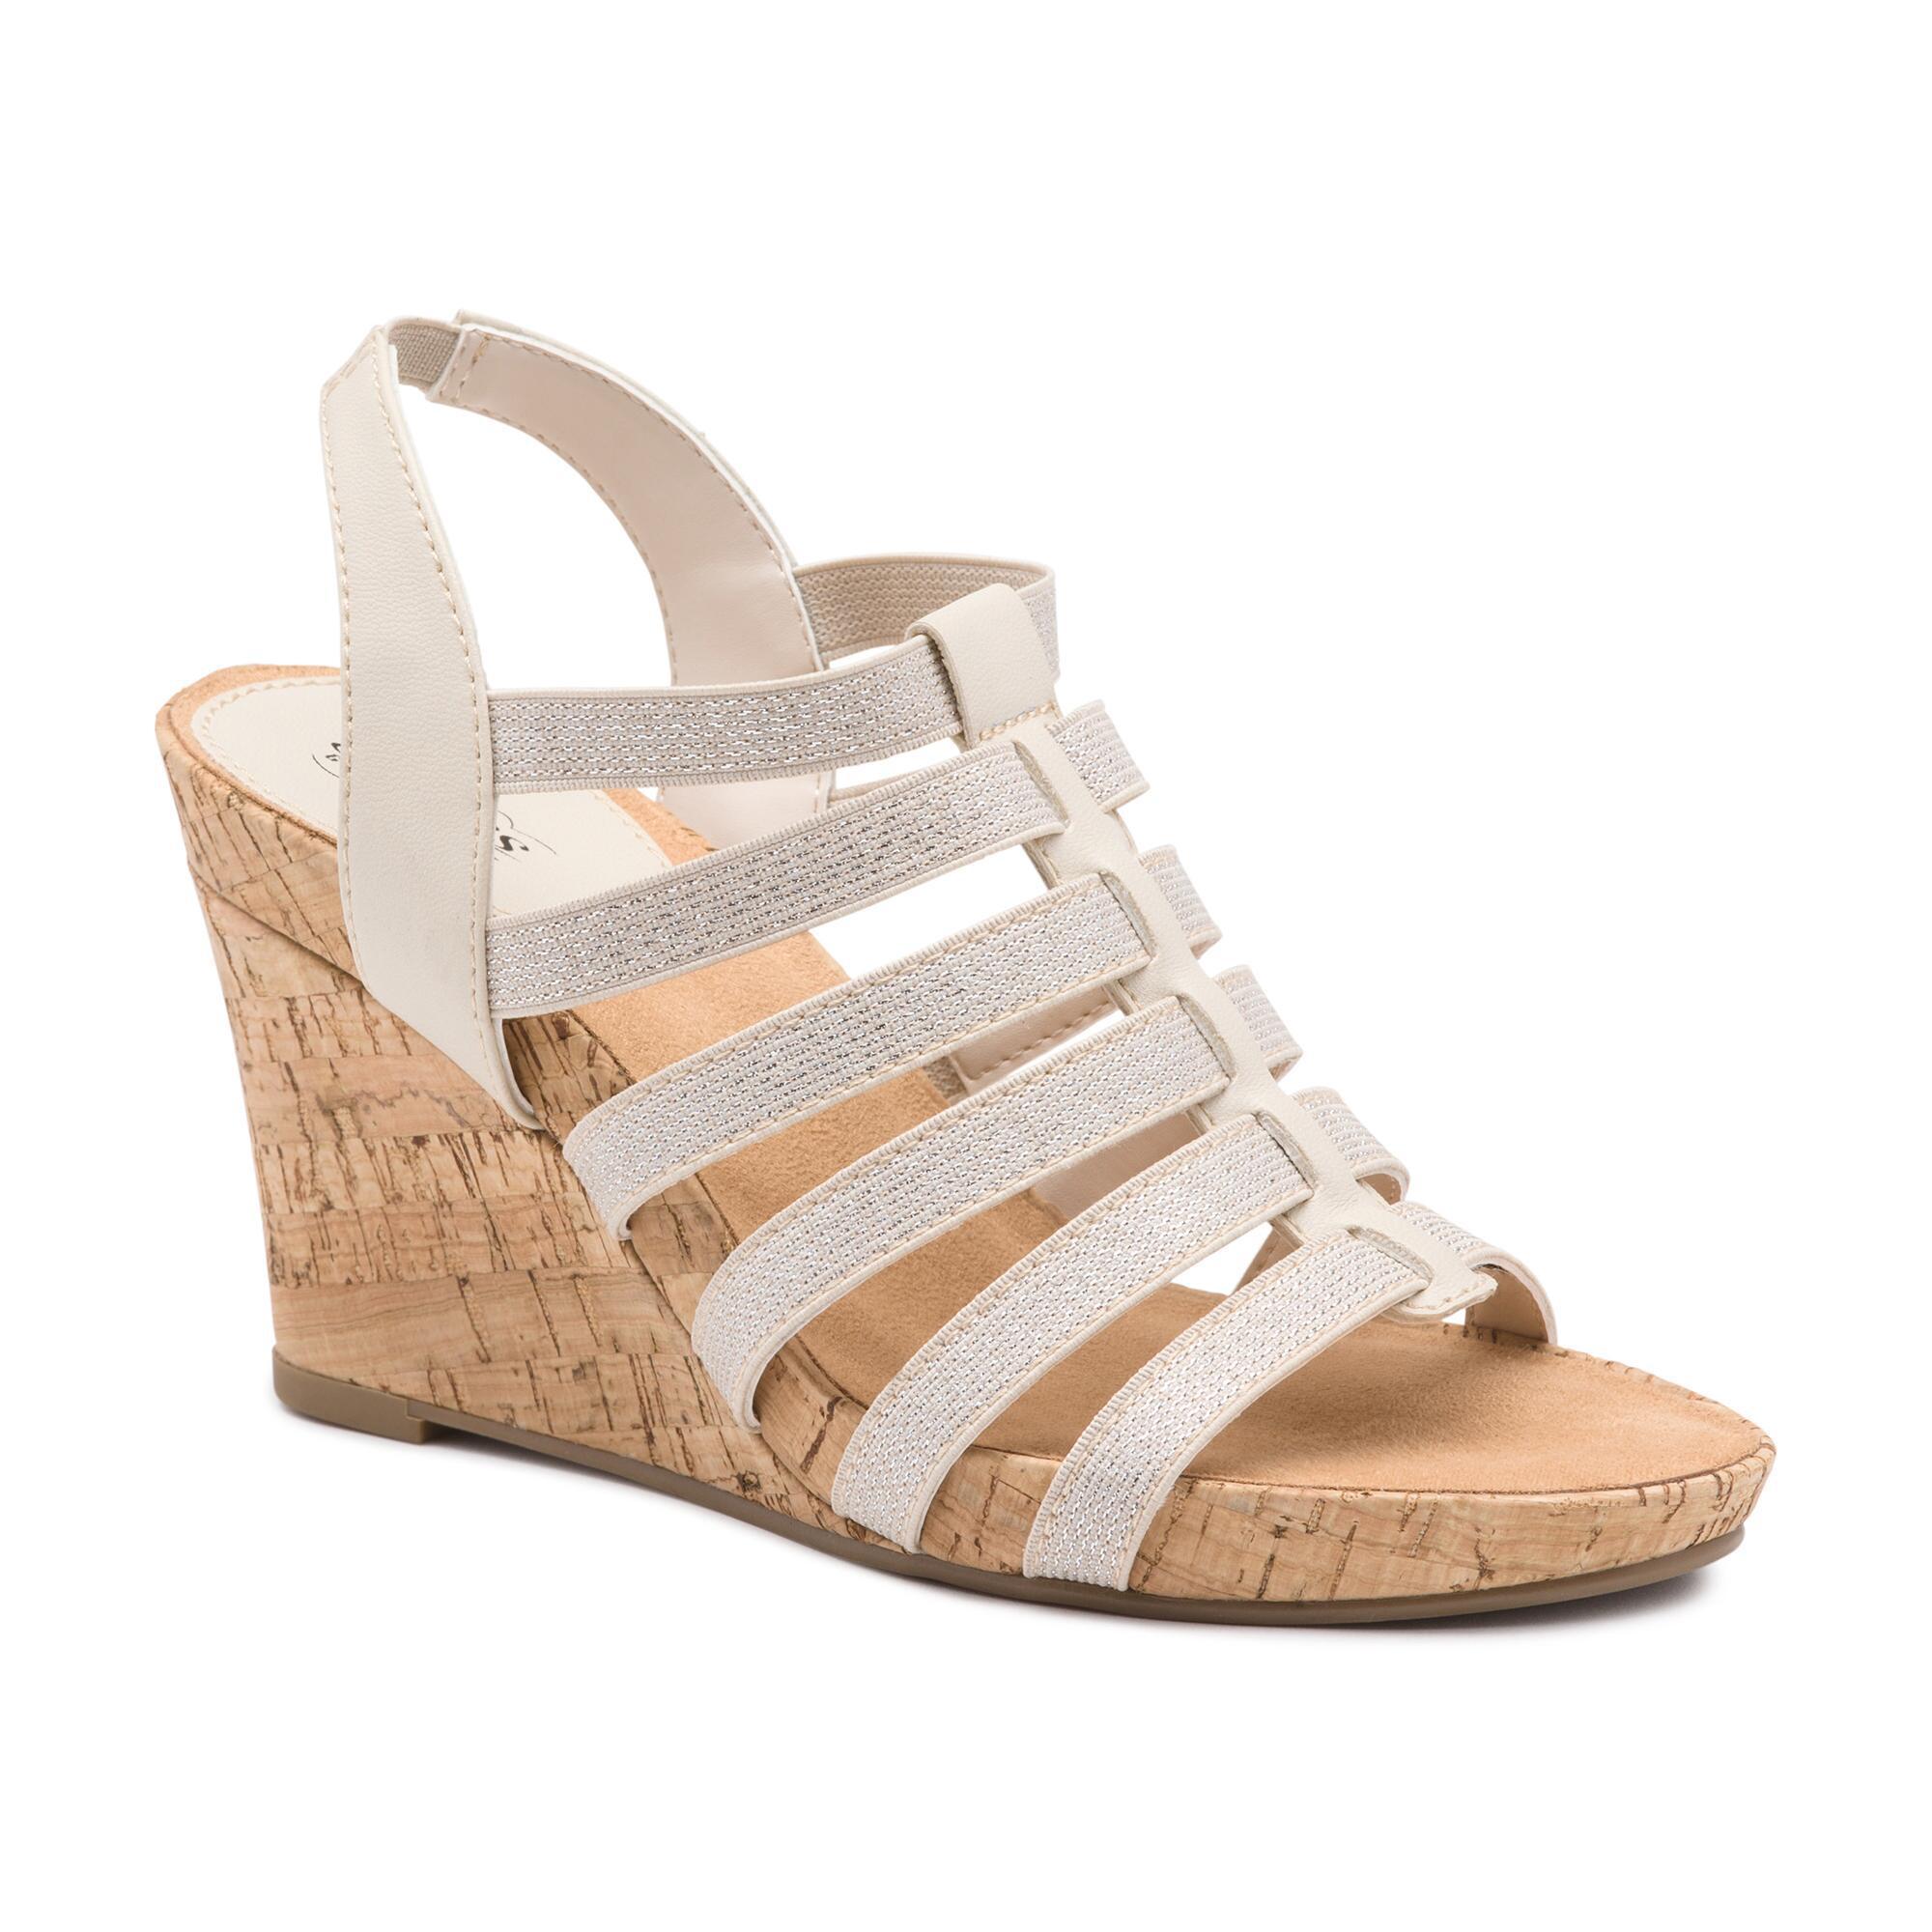 comforter sandals fixed orange adjustable burnt wedge main slide sandal comfort womens marilyn